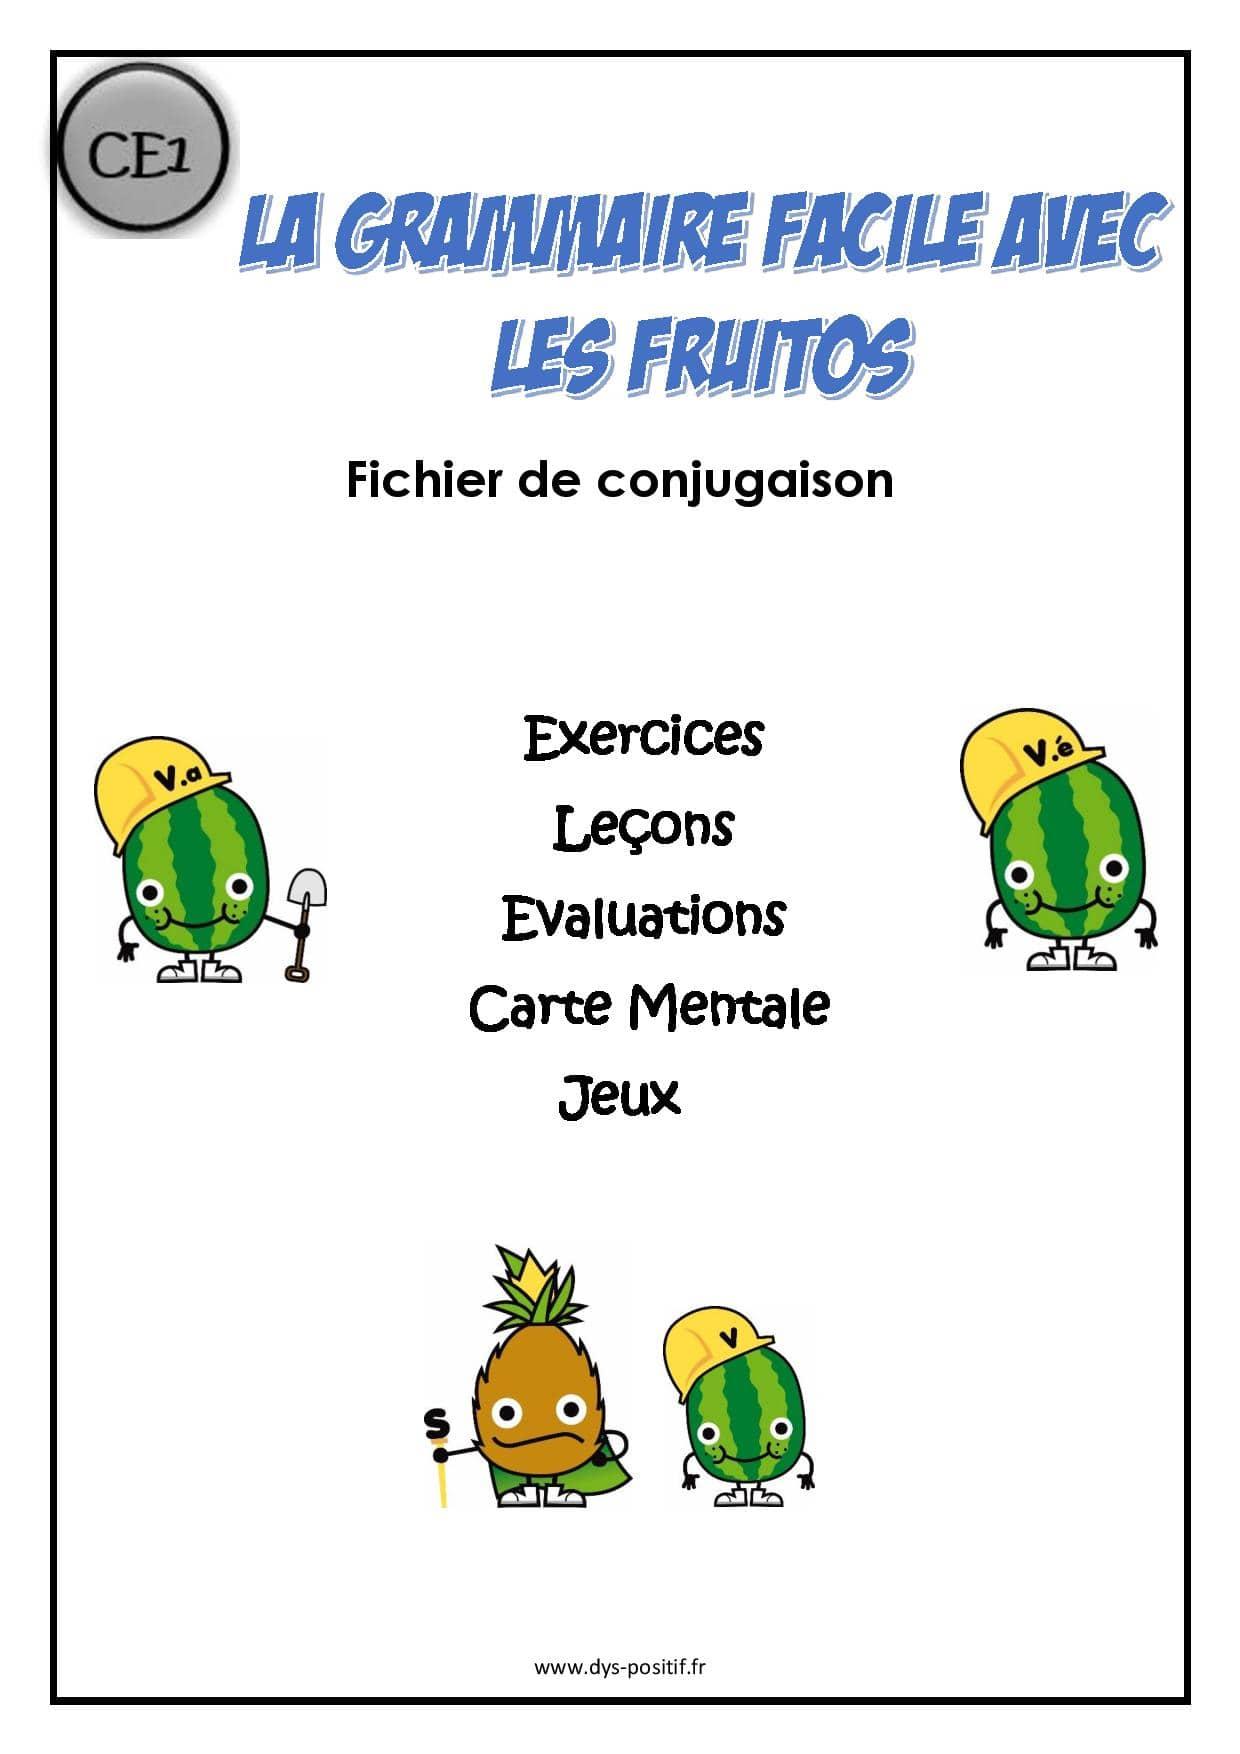 Conjugaison CE1 - Méthode Fruitos